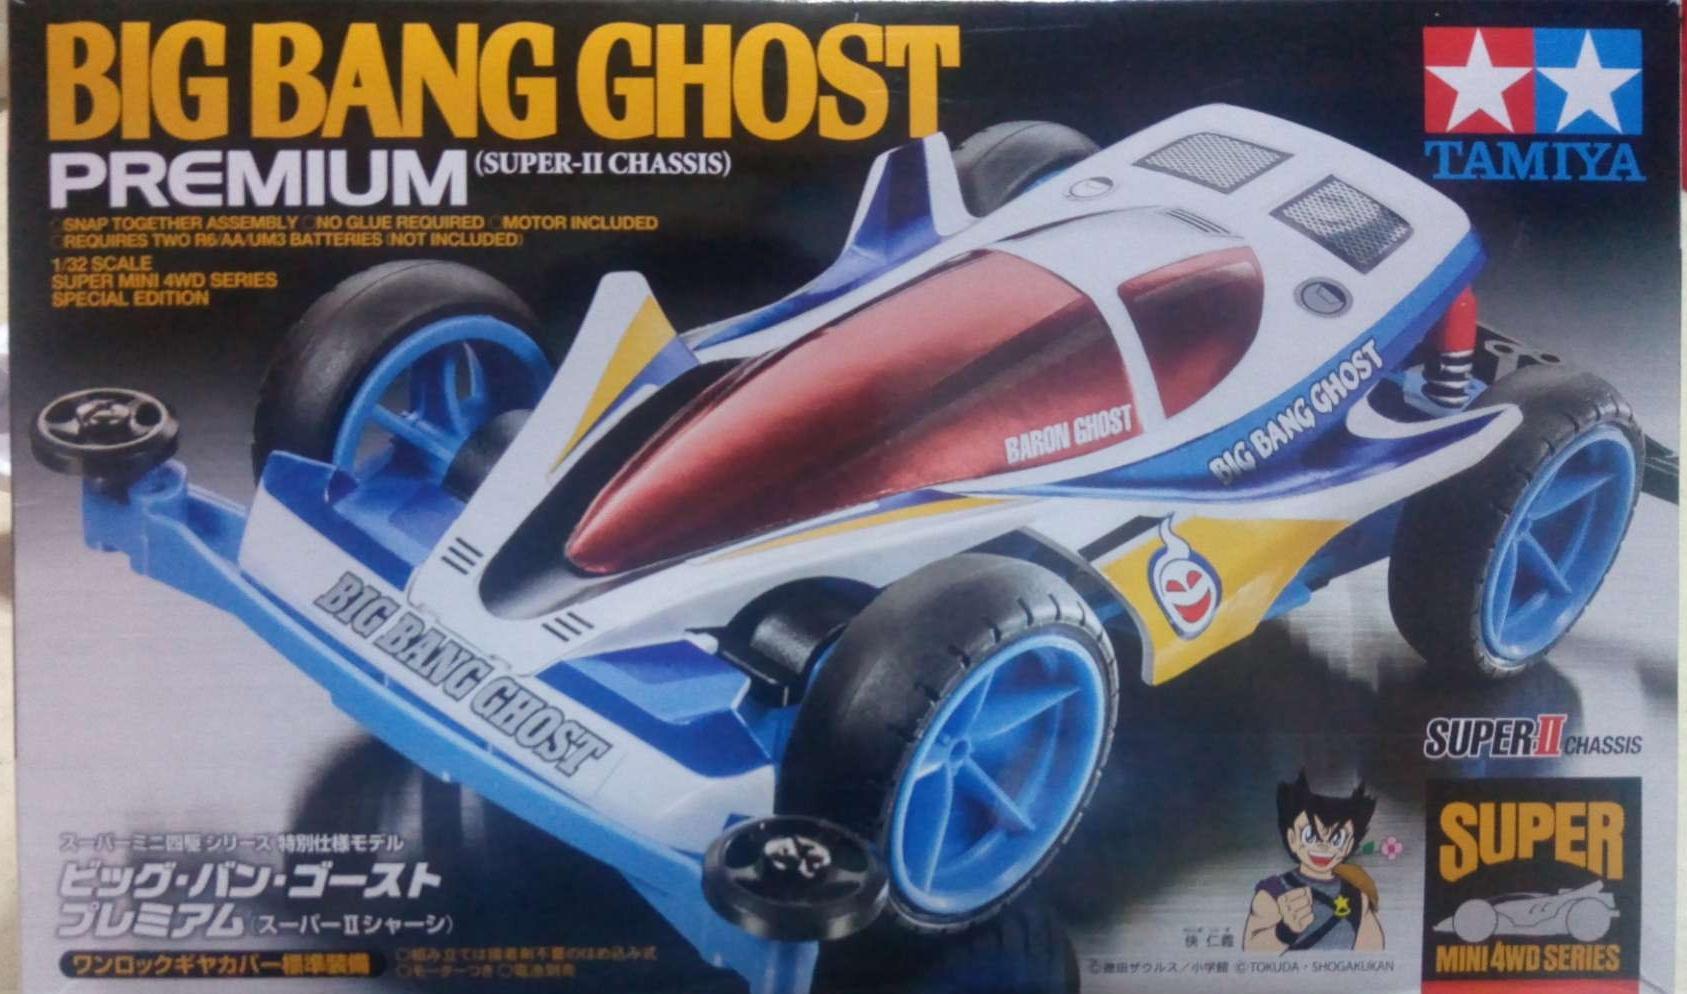 Mini 4wd Tuning E Custom Foto 6 T Tamiya Super Ii Chassis Red Original Big Bang Ghost Premium